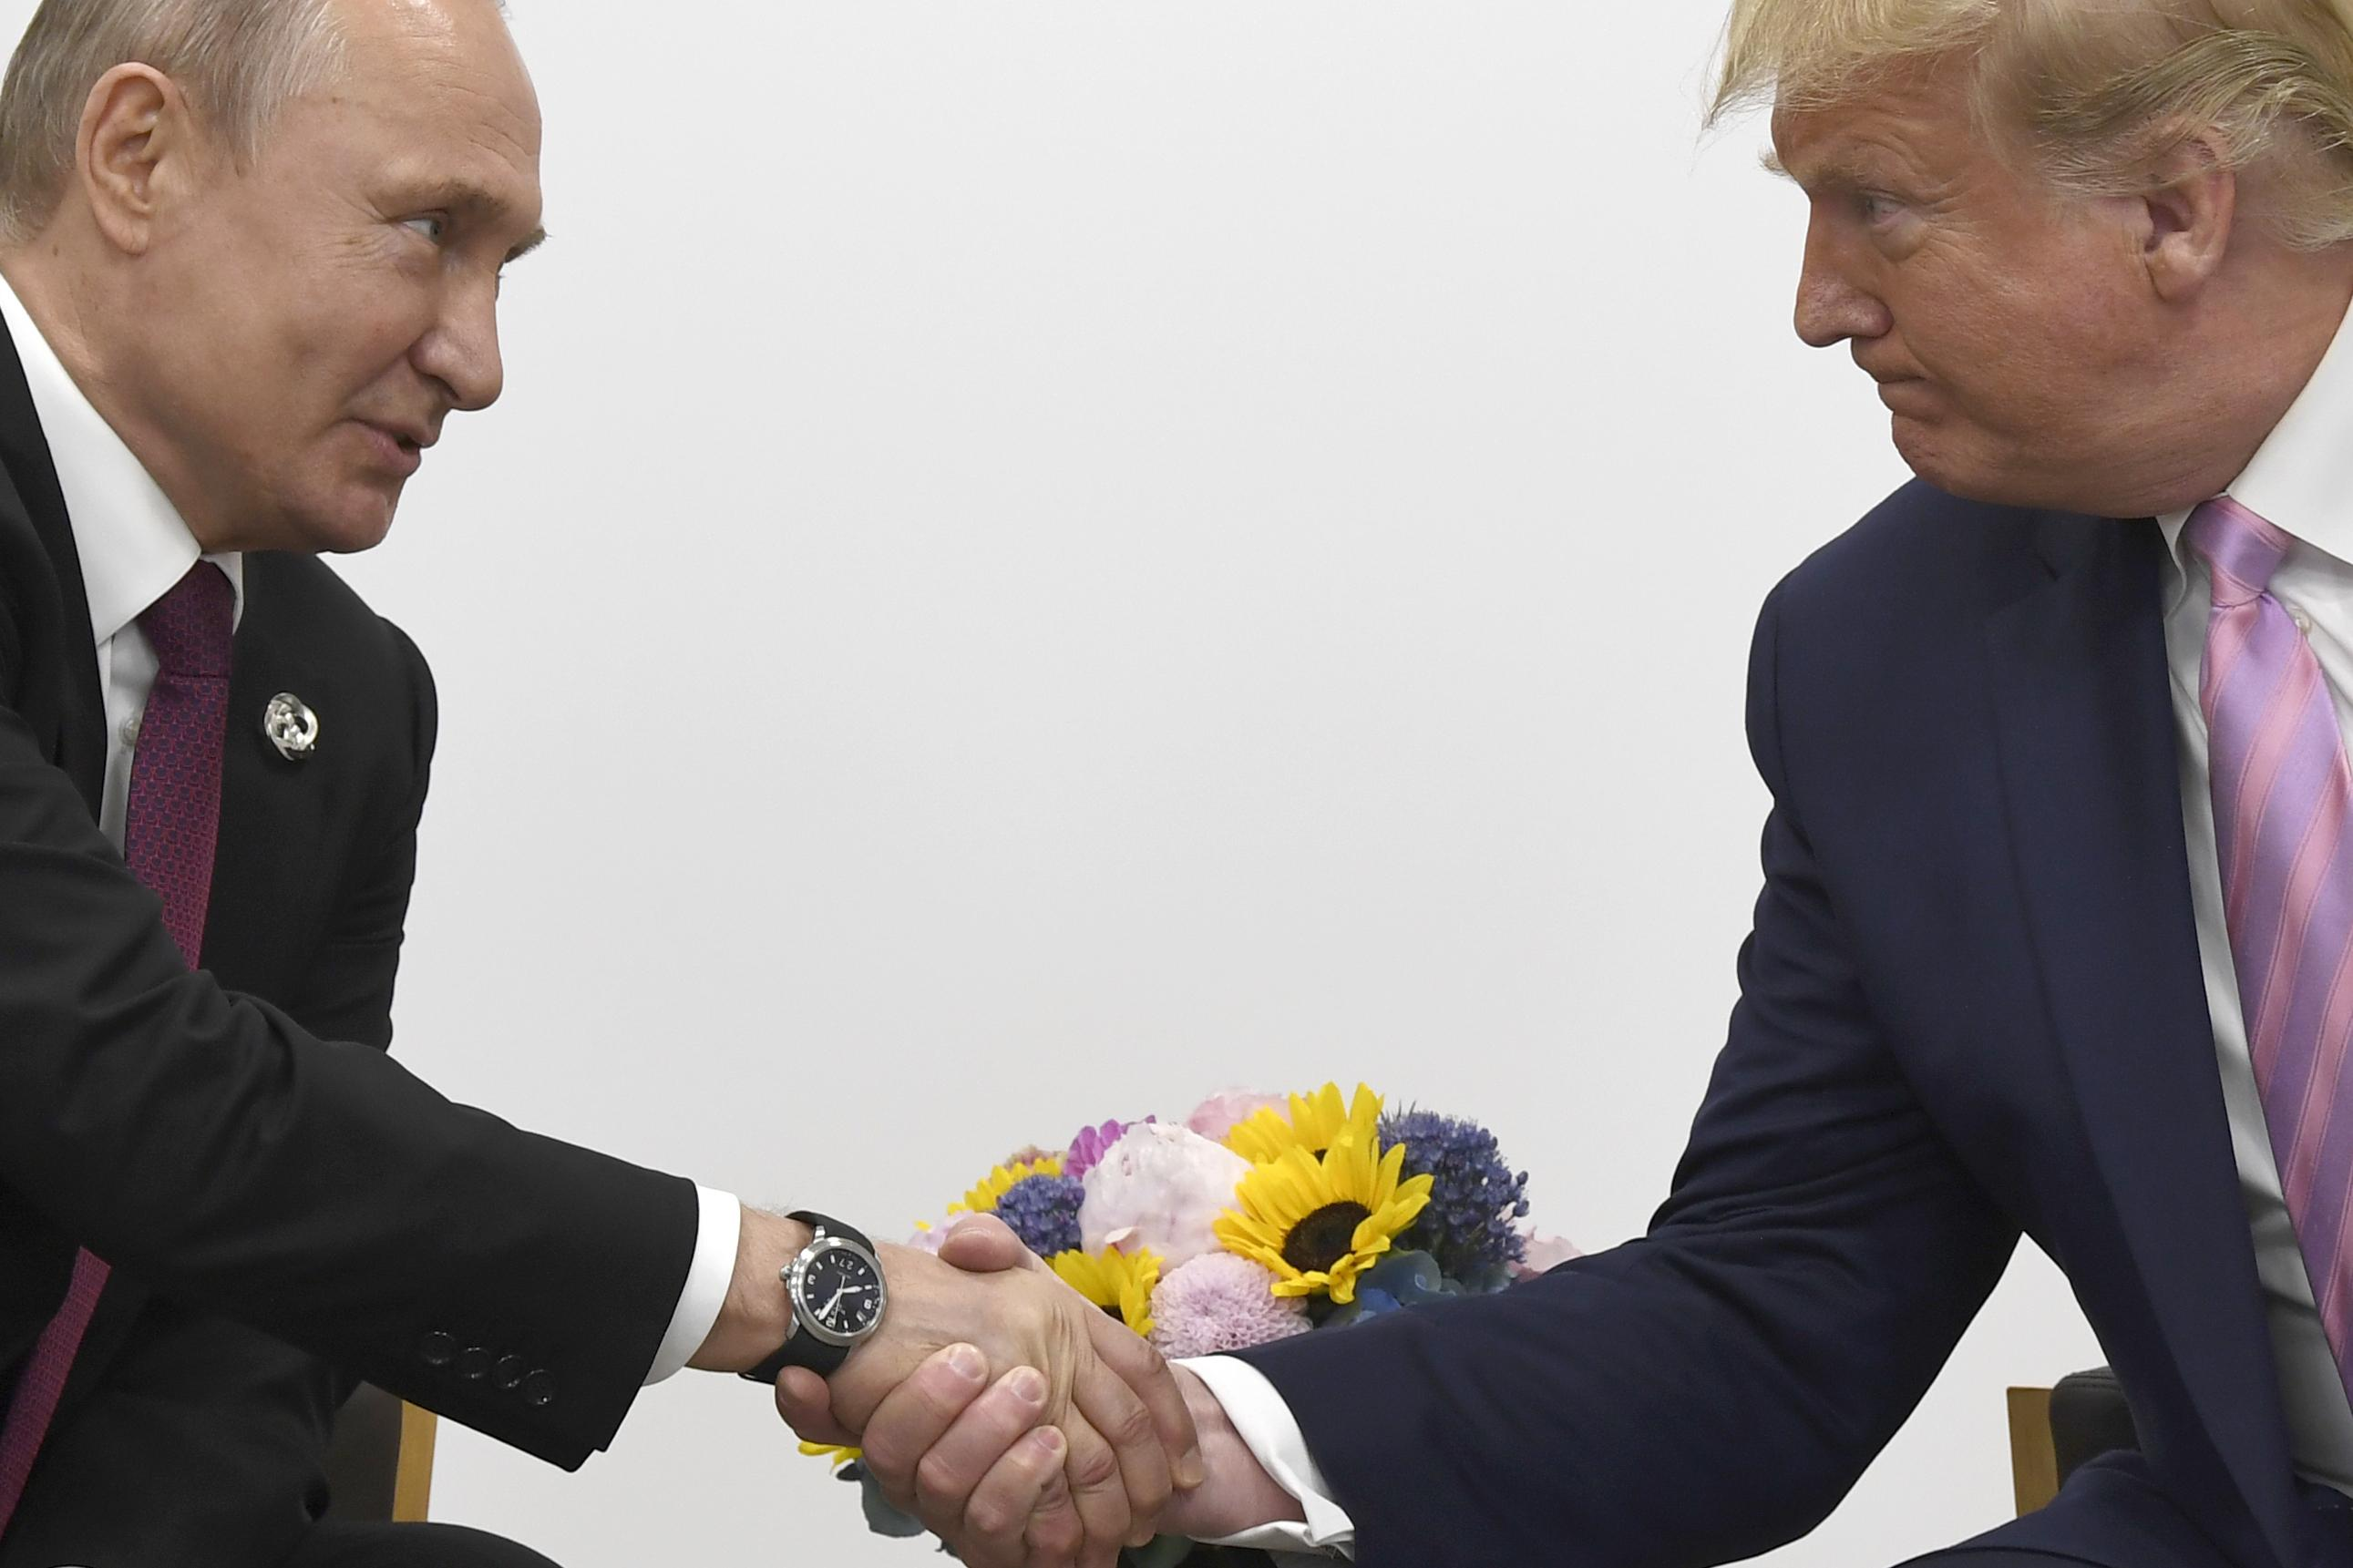 CROSSTALK: Trump should send Sam Nunn to Moscow